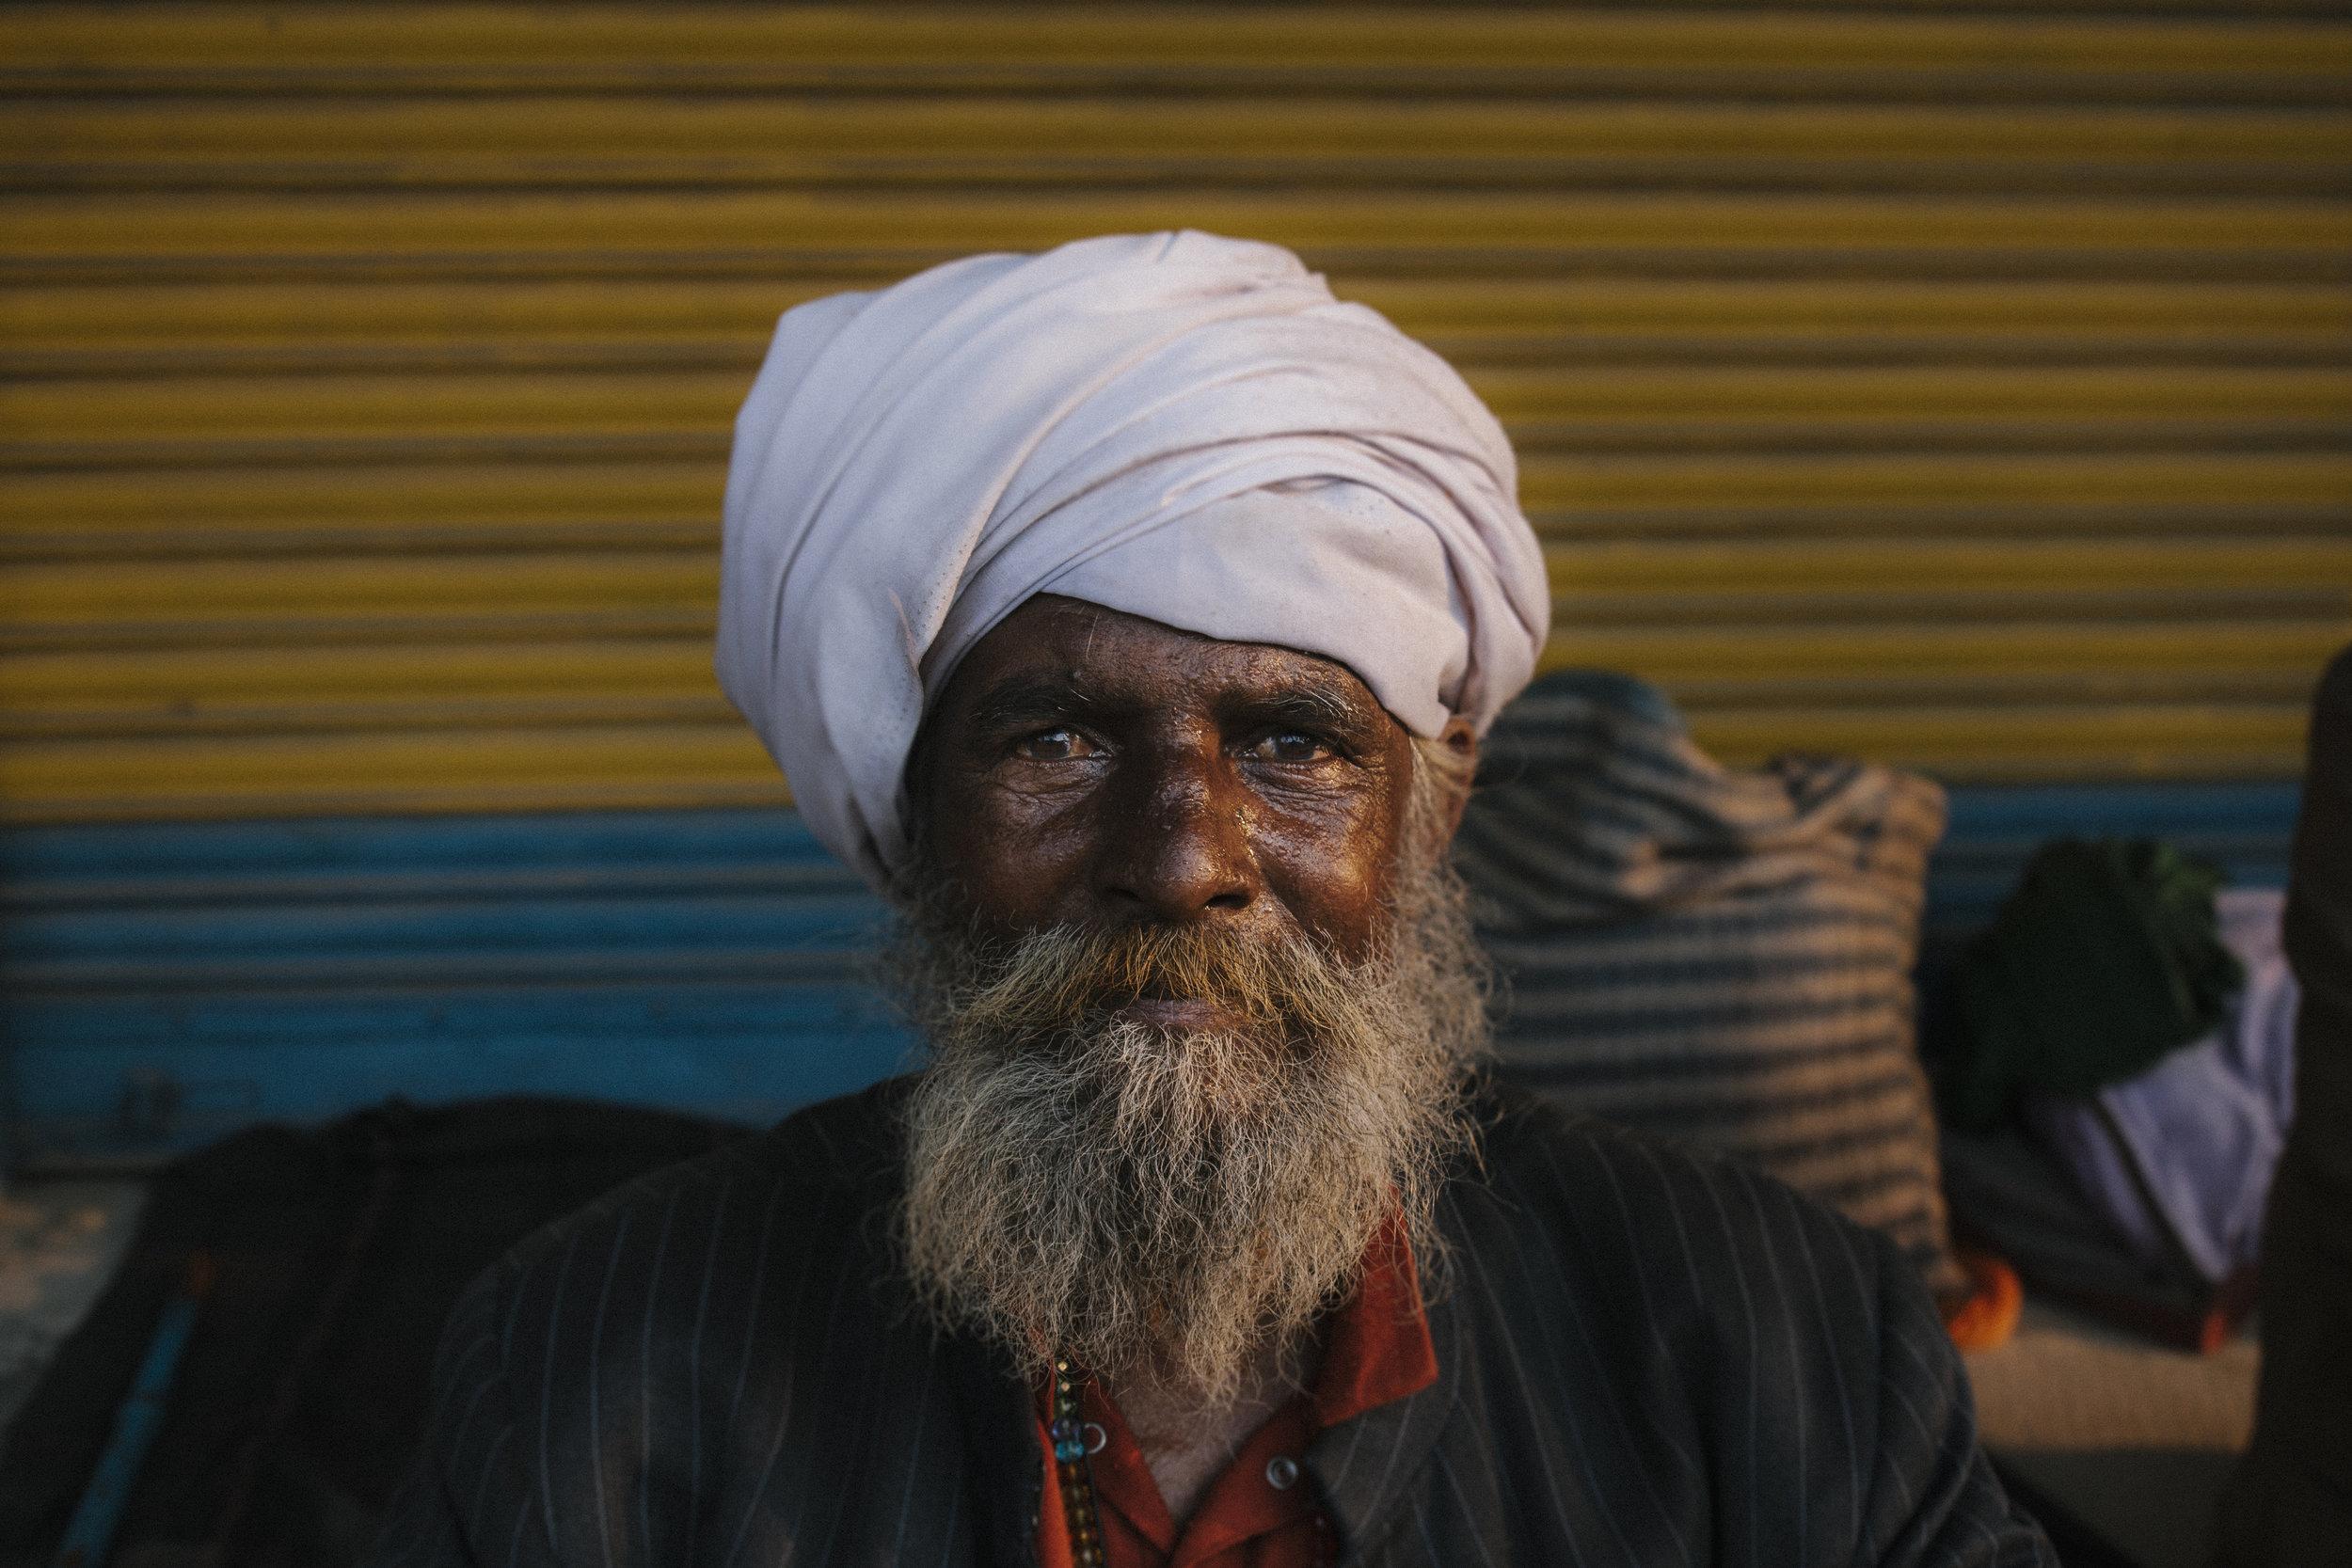 india_afteredit-3078.jpg